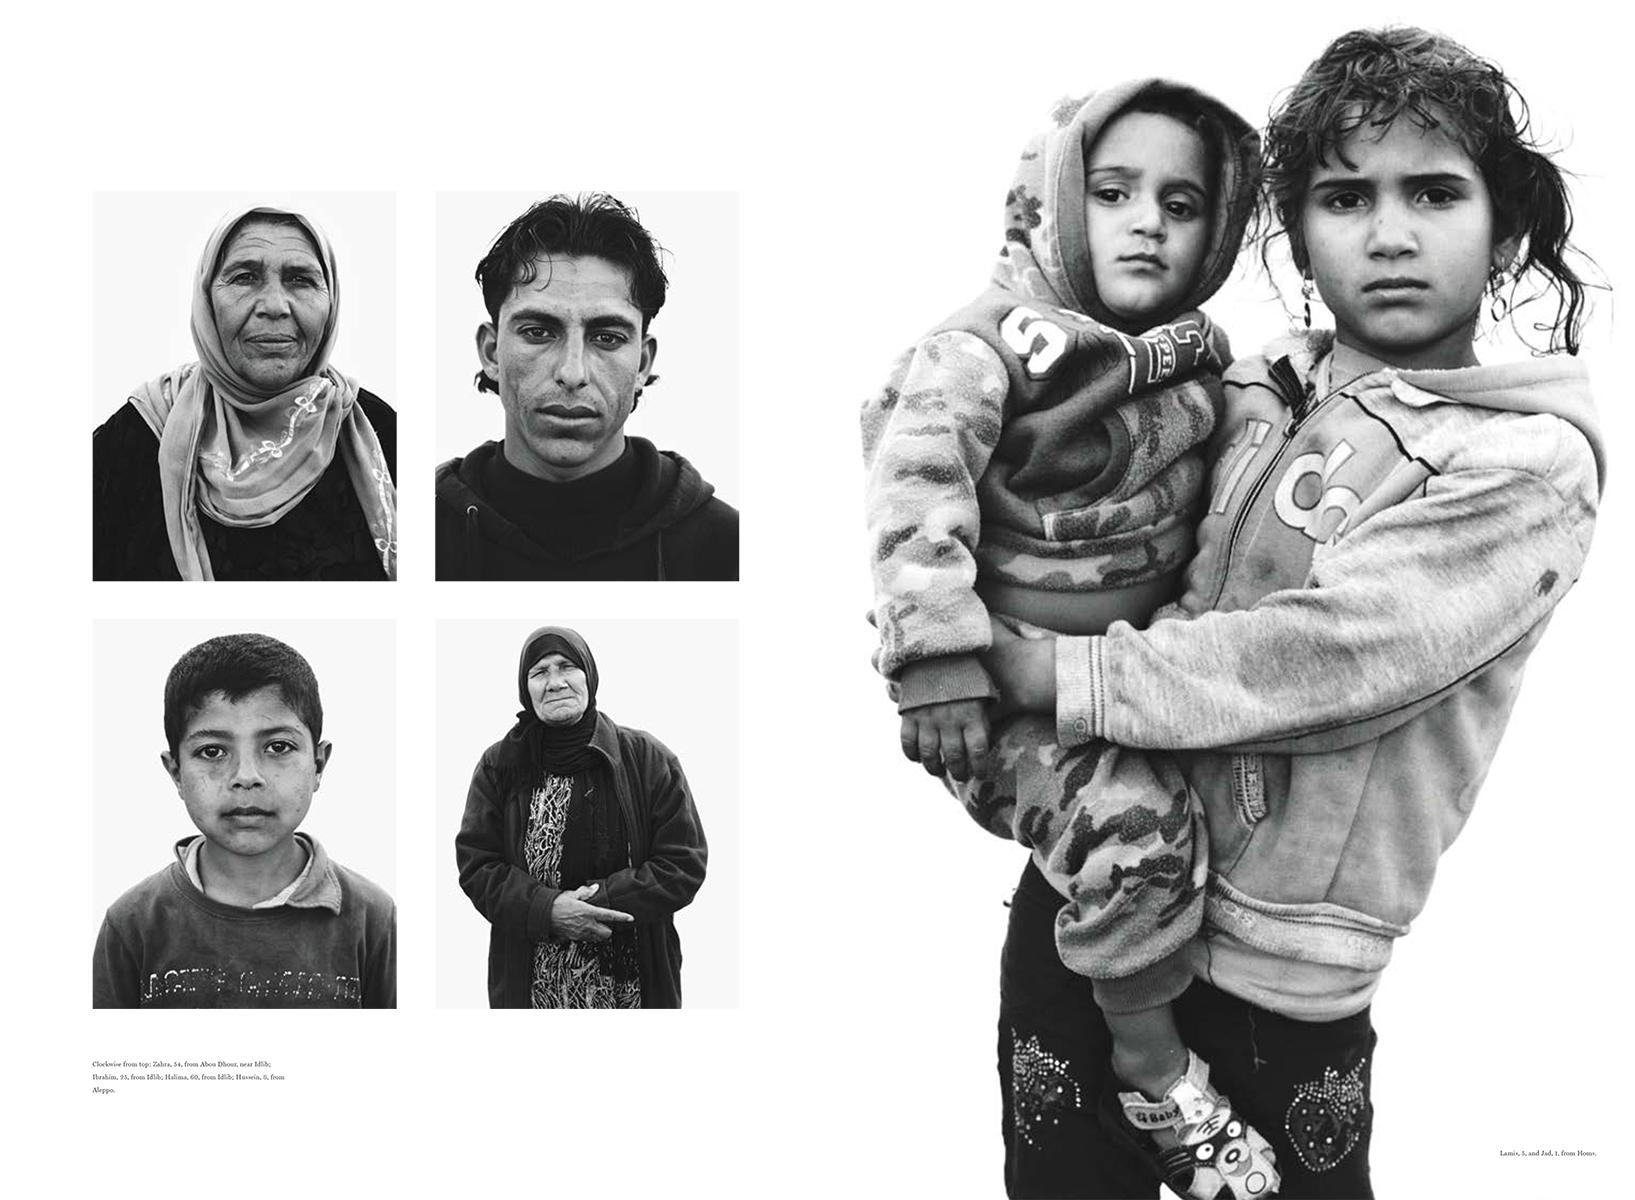 Humanity-10-Gustavo-46.jpg